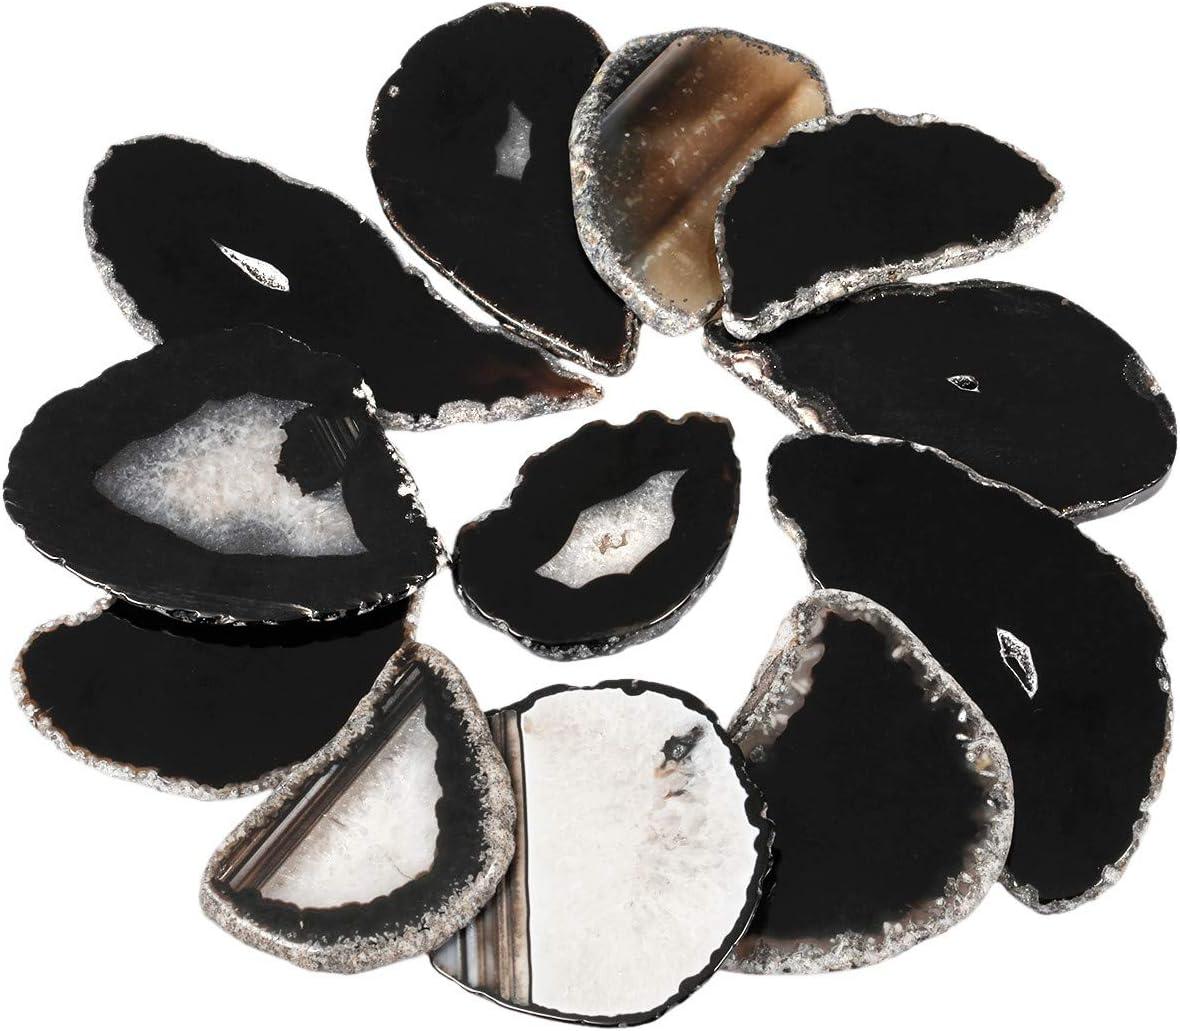 mookaitedecor 10 Piezas de rodajas de ágata de Cristal para bisutería, Piedra de geoda para Colgante, Collar, Abalorios, Manualidades, decoración, Piedra, Black/Undrilled(1.7-3.1